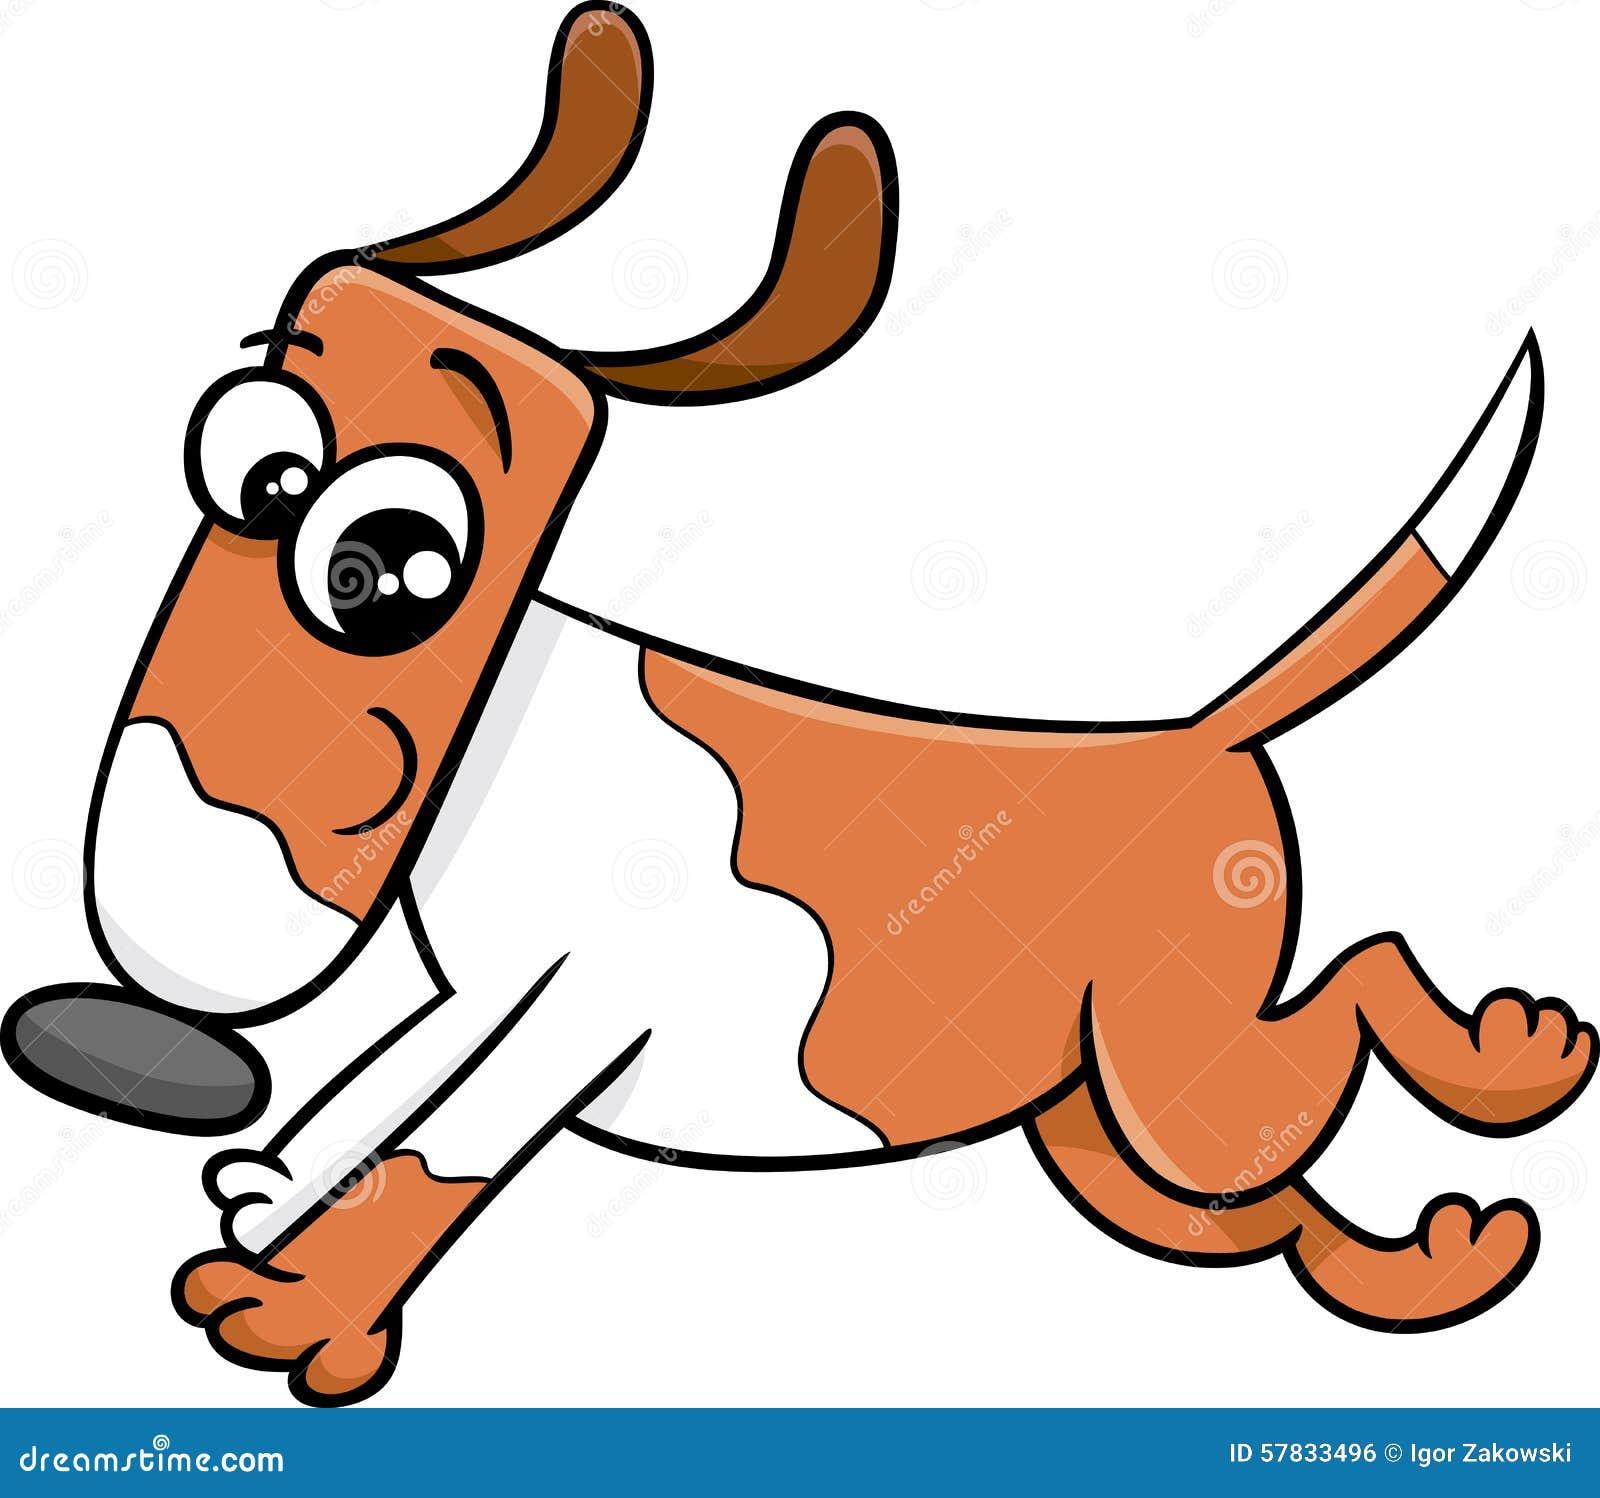 A Cartoon Character Dog : Puppy dog cartoon character vector cartoondealer